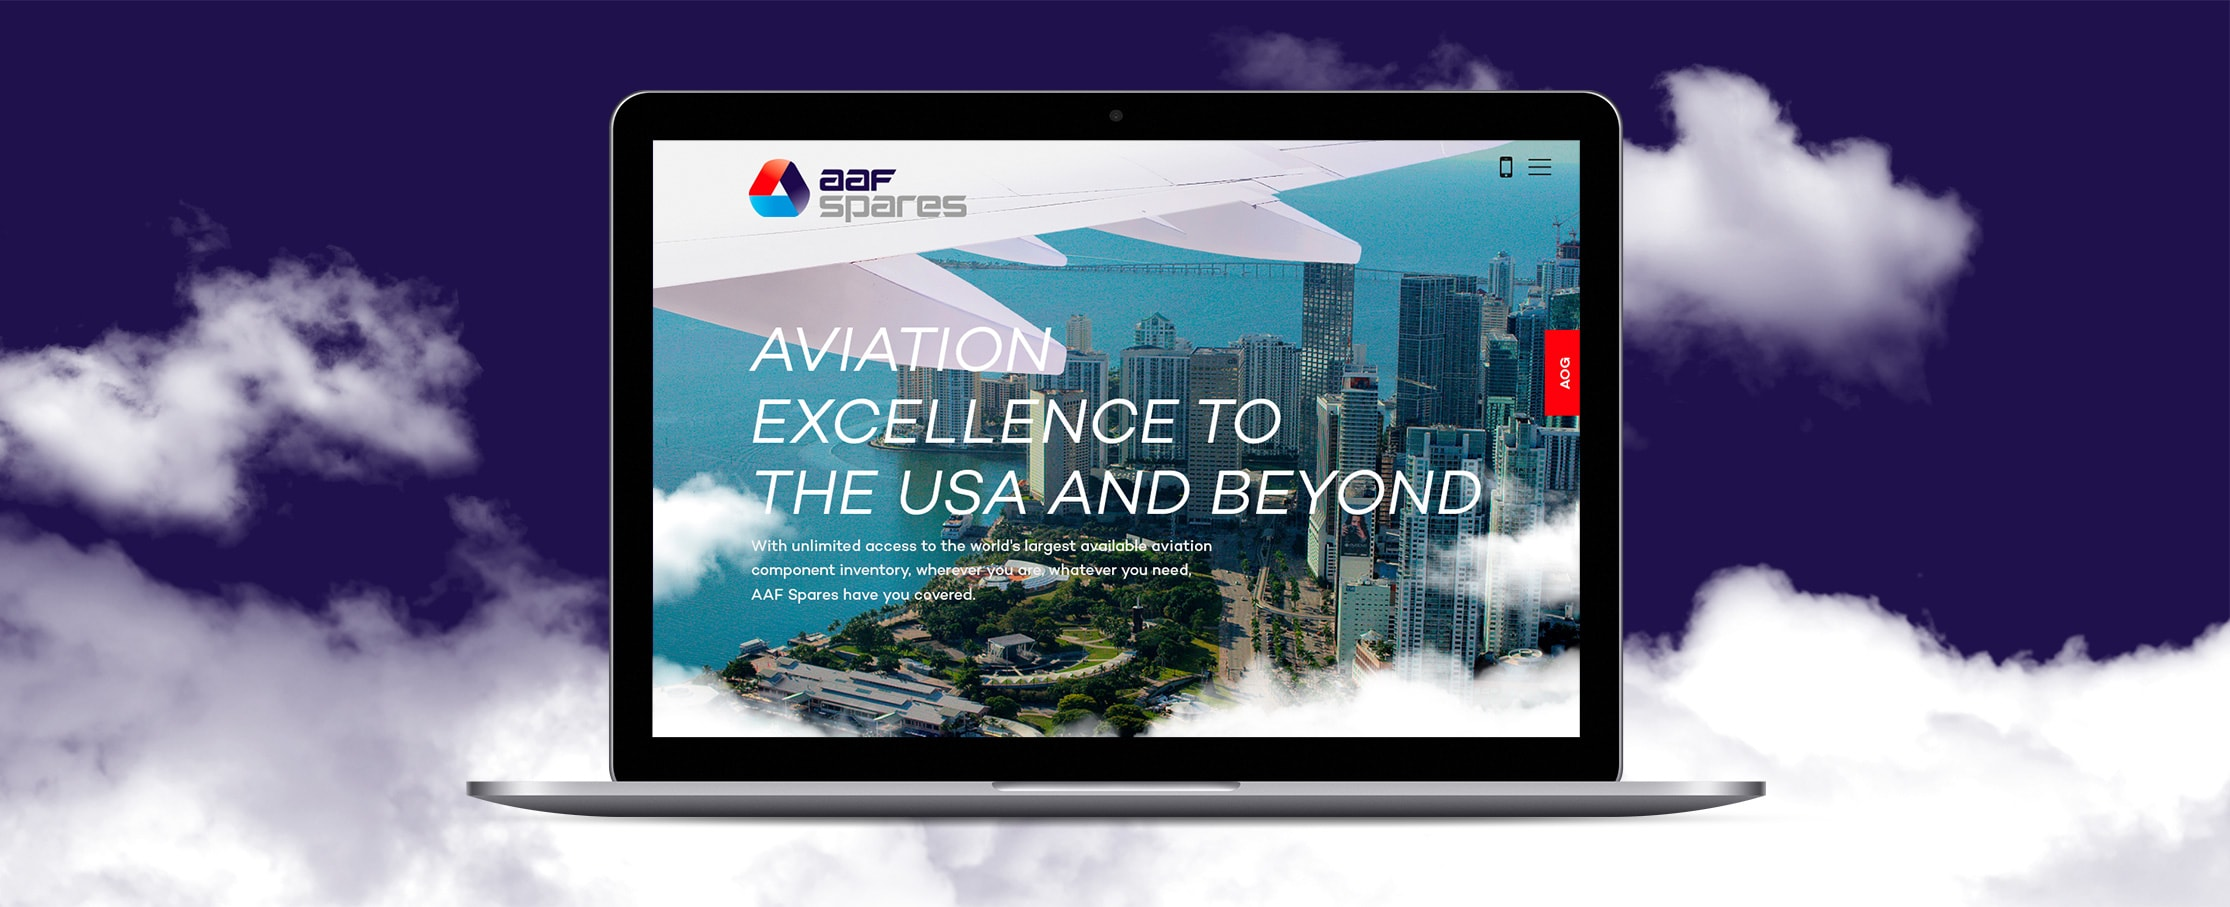 US aviation web designs AAF Spares